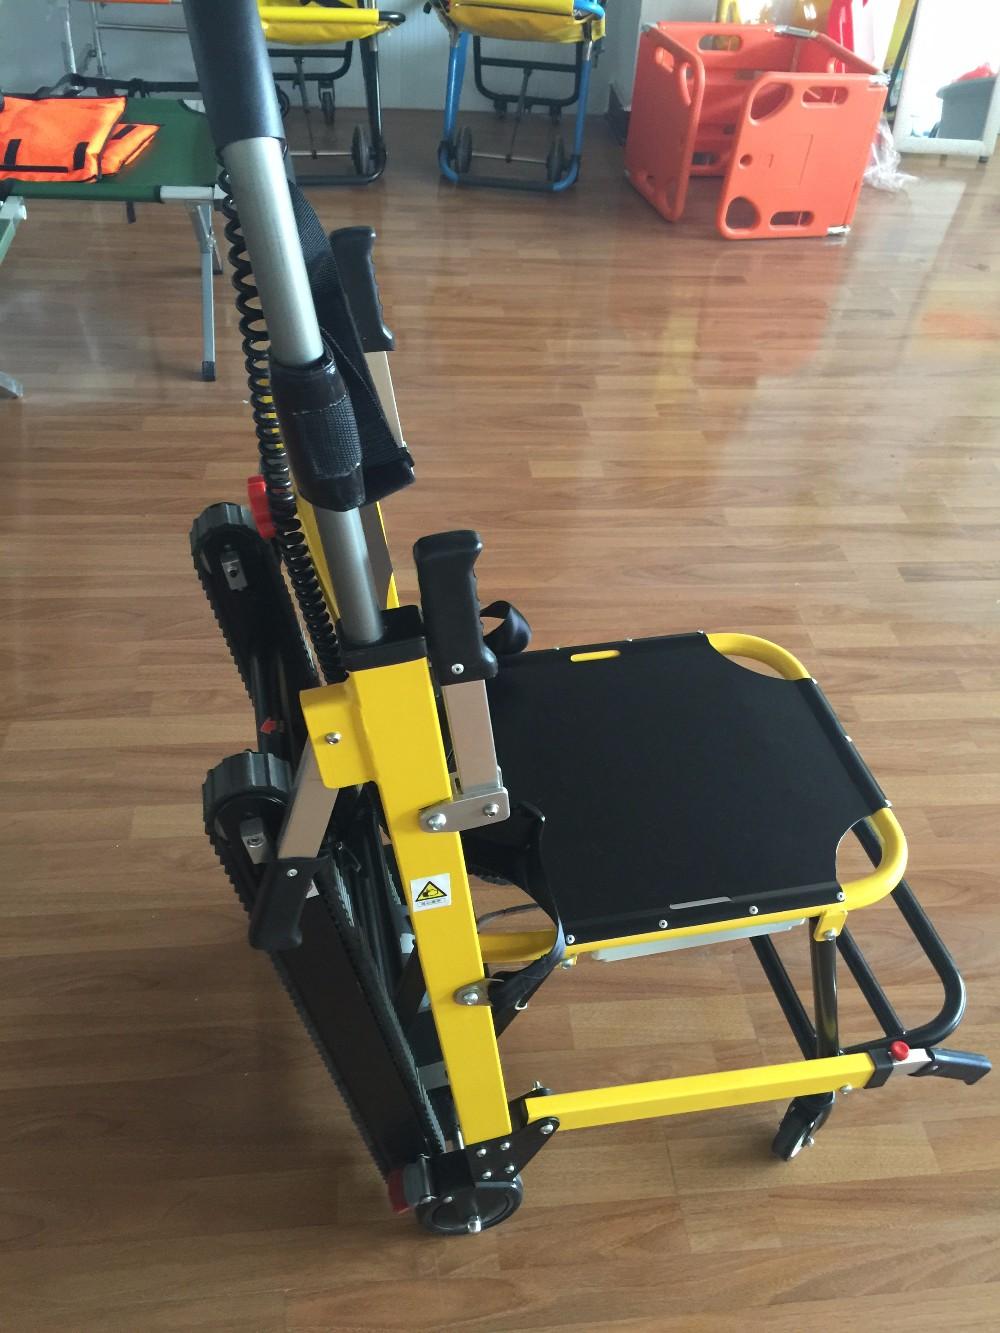 Dw St003 Stair Chair Price Kneeless Carpet Stretcher Buy